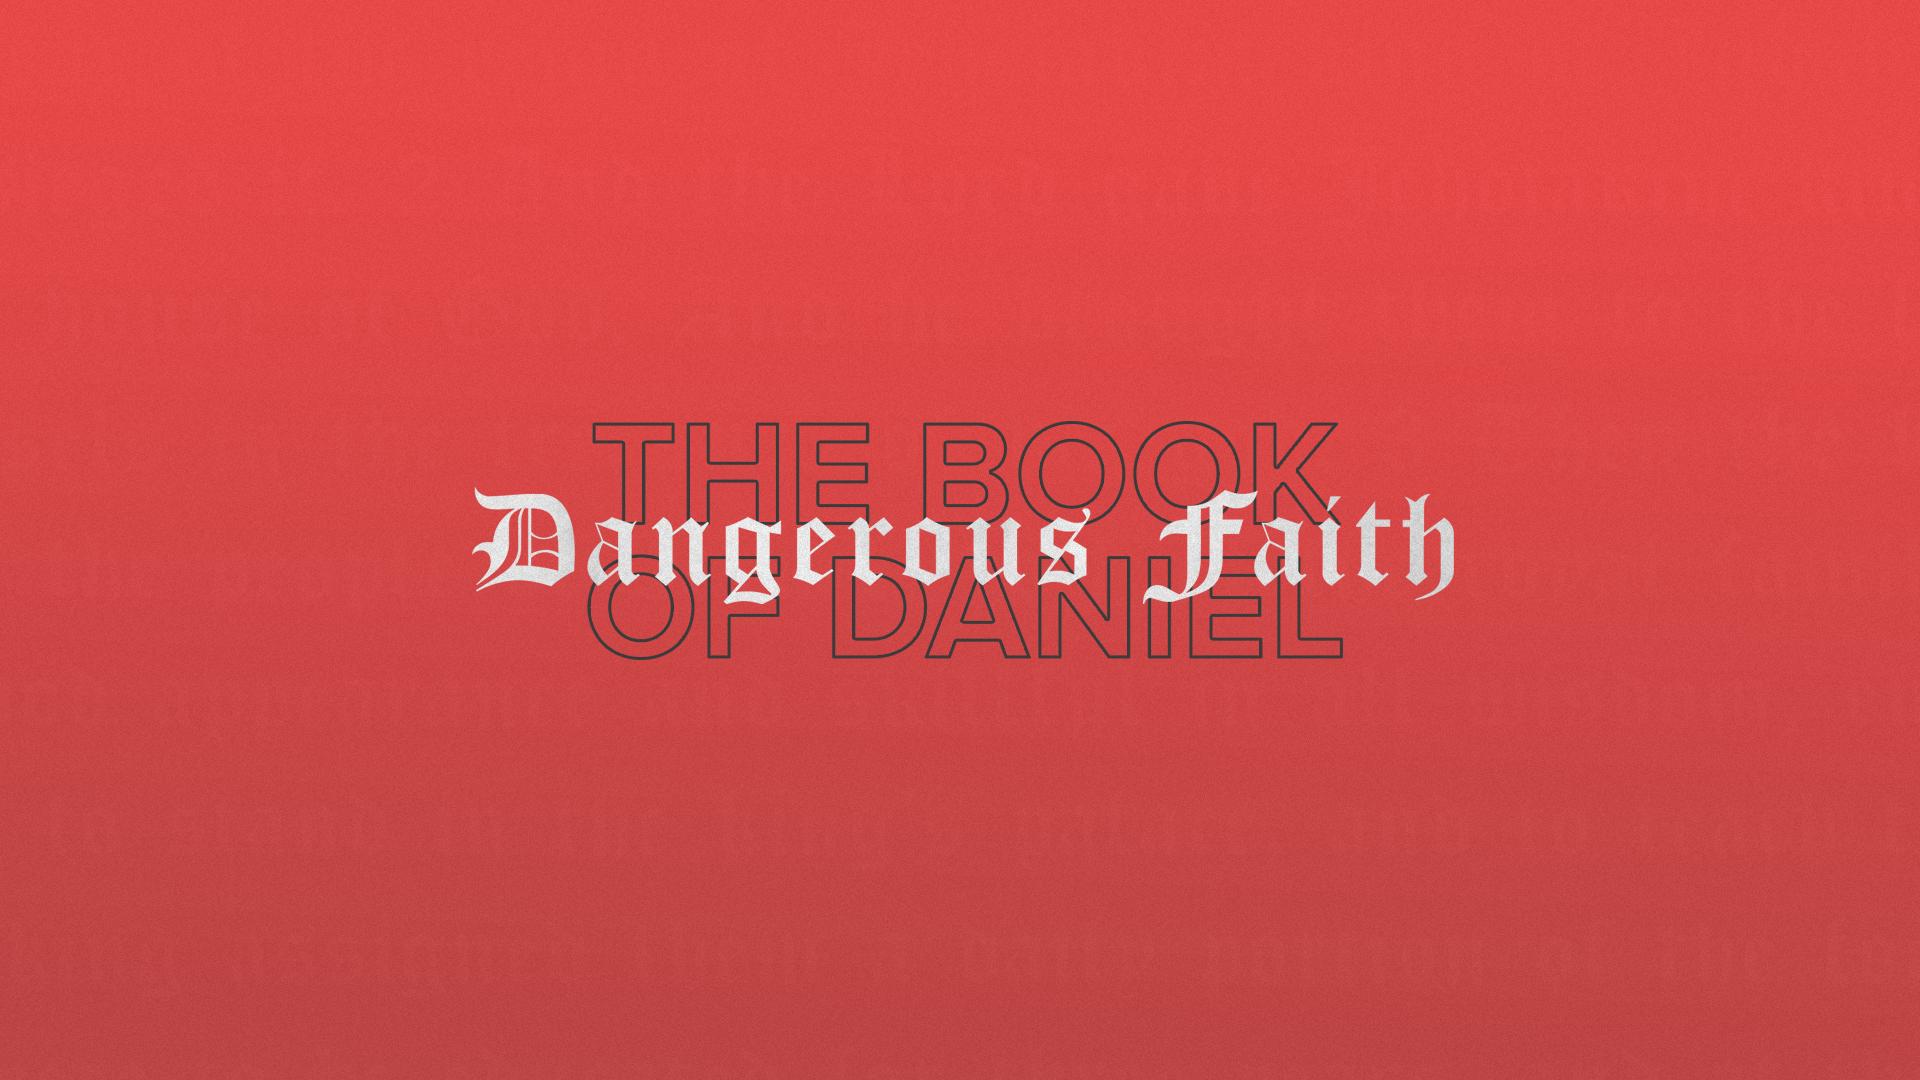 The Book of Daniel: Dangerous Faith